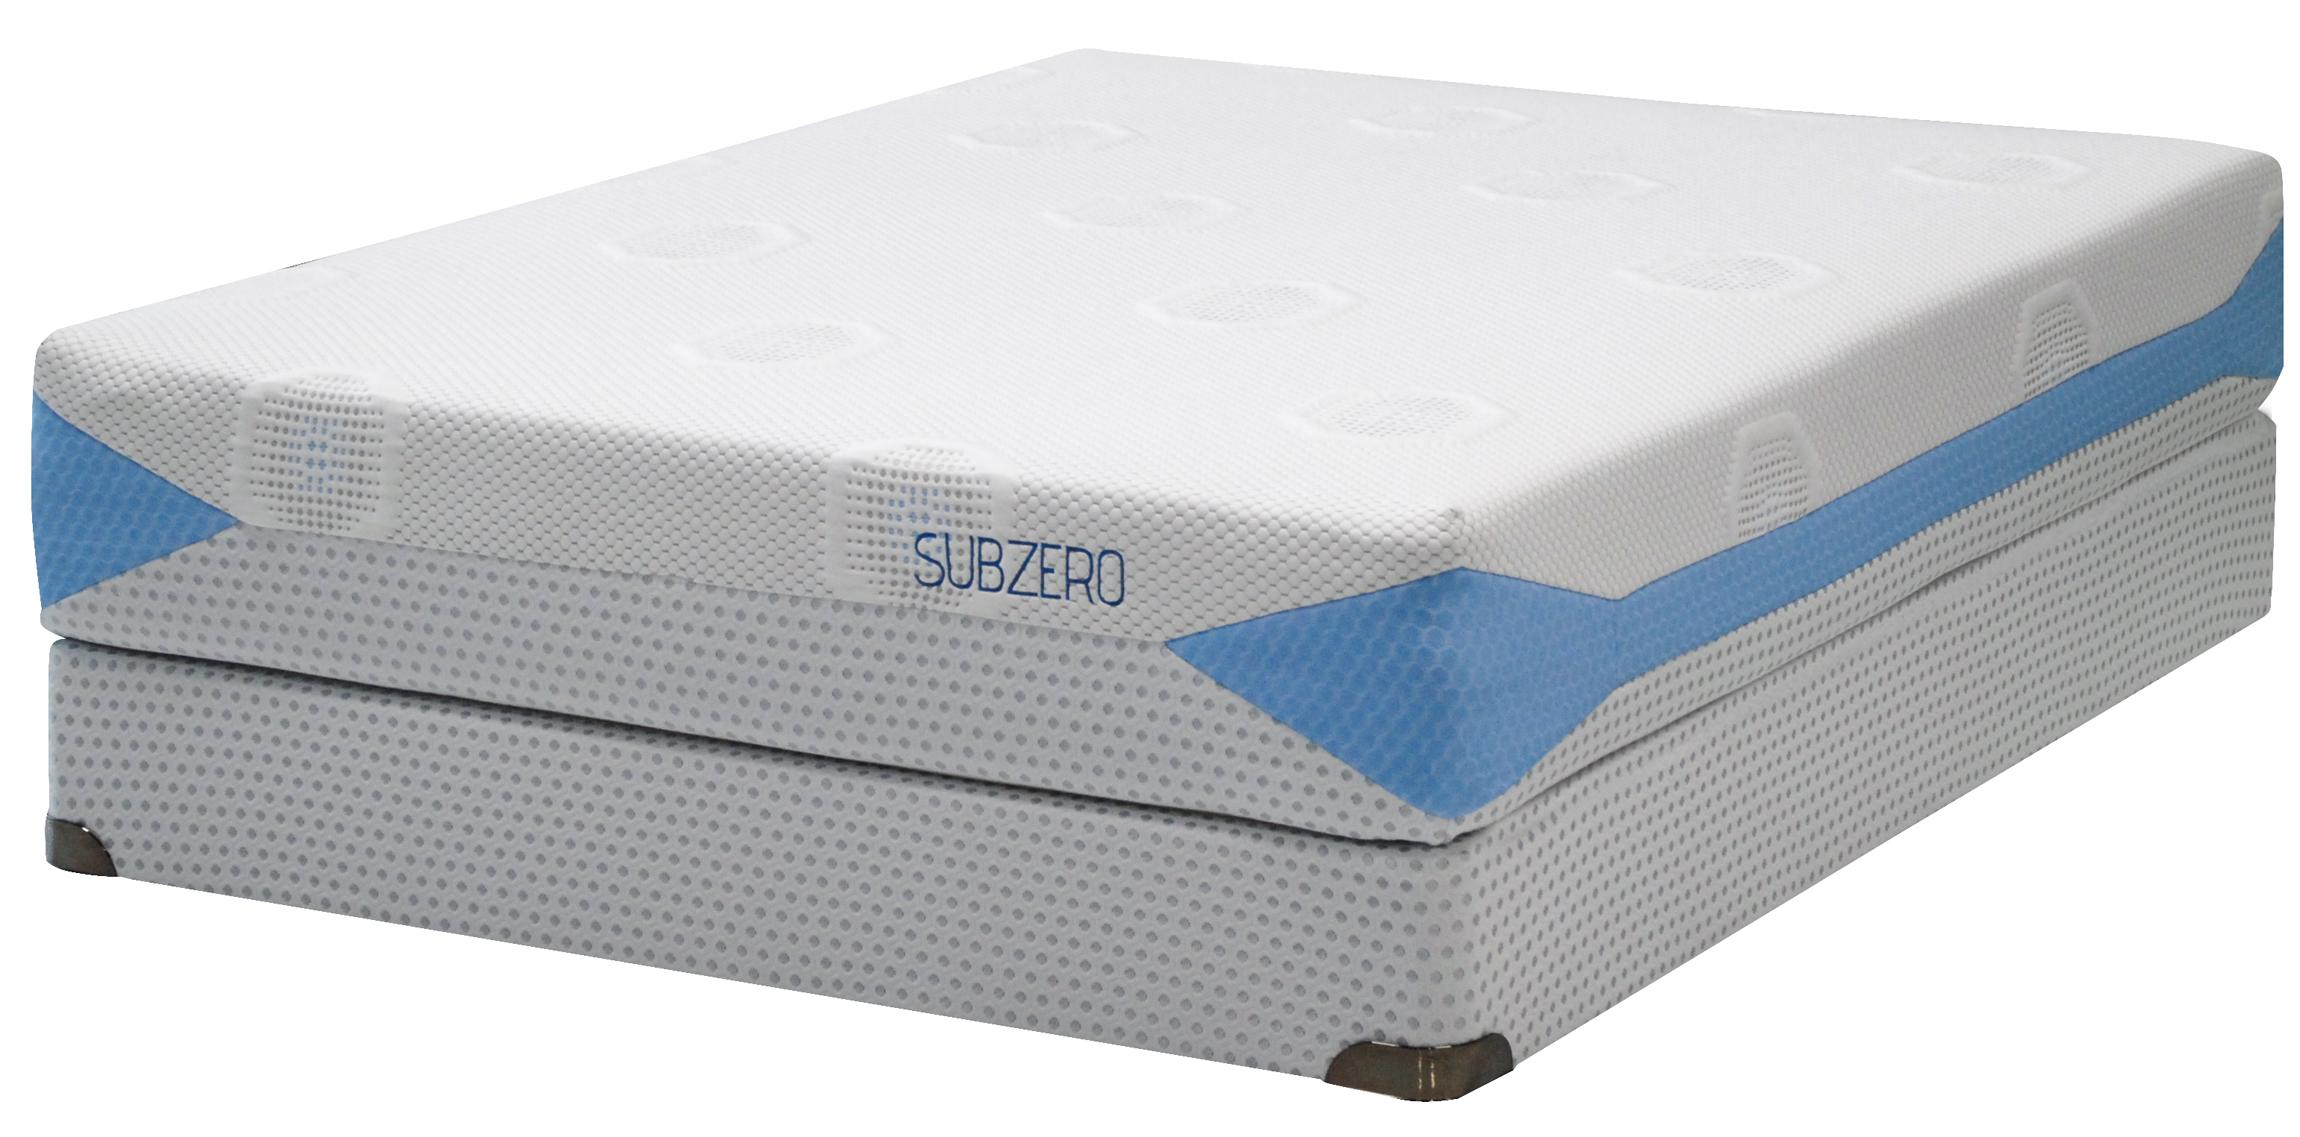 Kingsdown Blu-Tek Subzero Queen Memory Foam Mattress Set - Item Number: 2893Q+2880Q